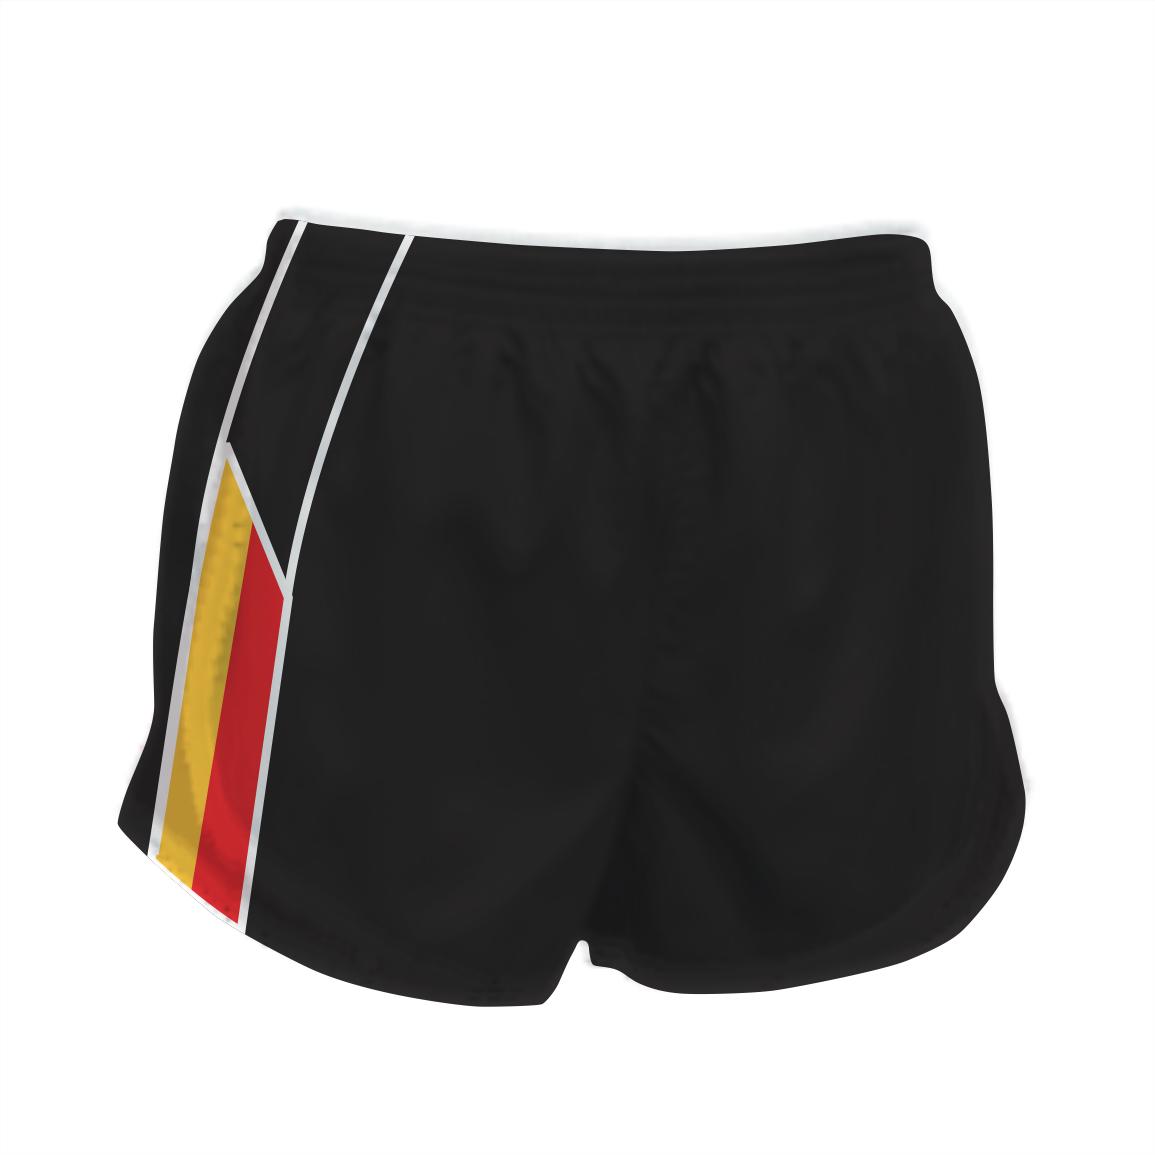 Panelled -Zuco running shorts - Vadim